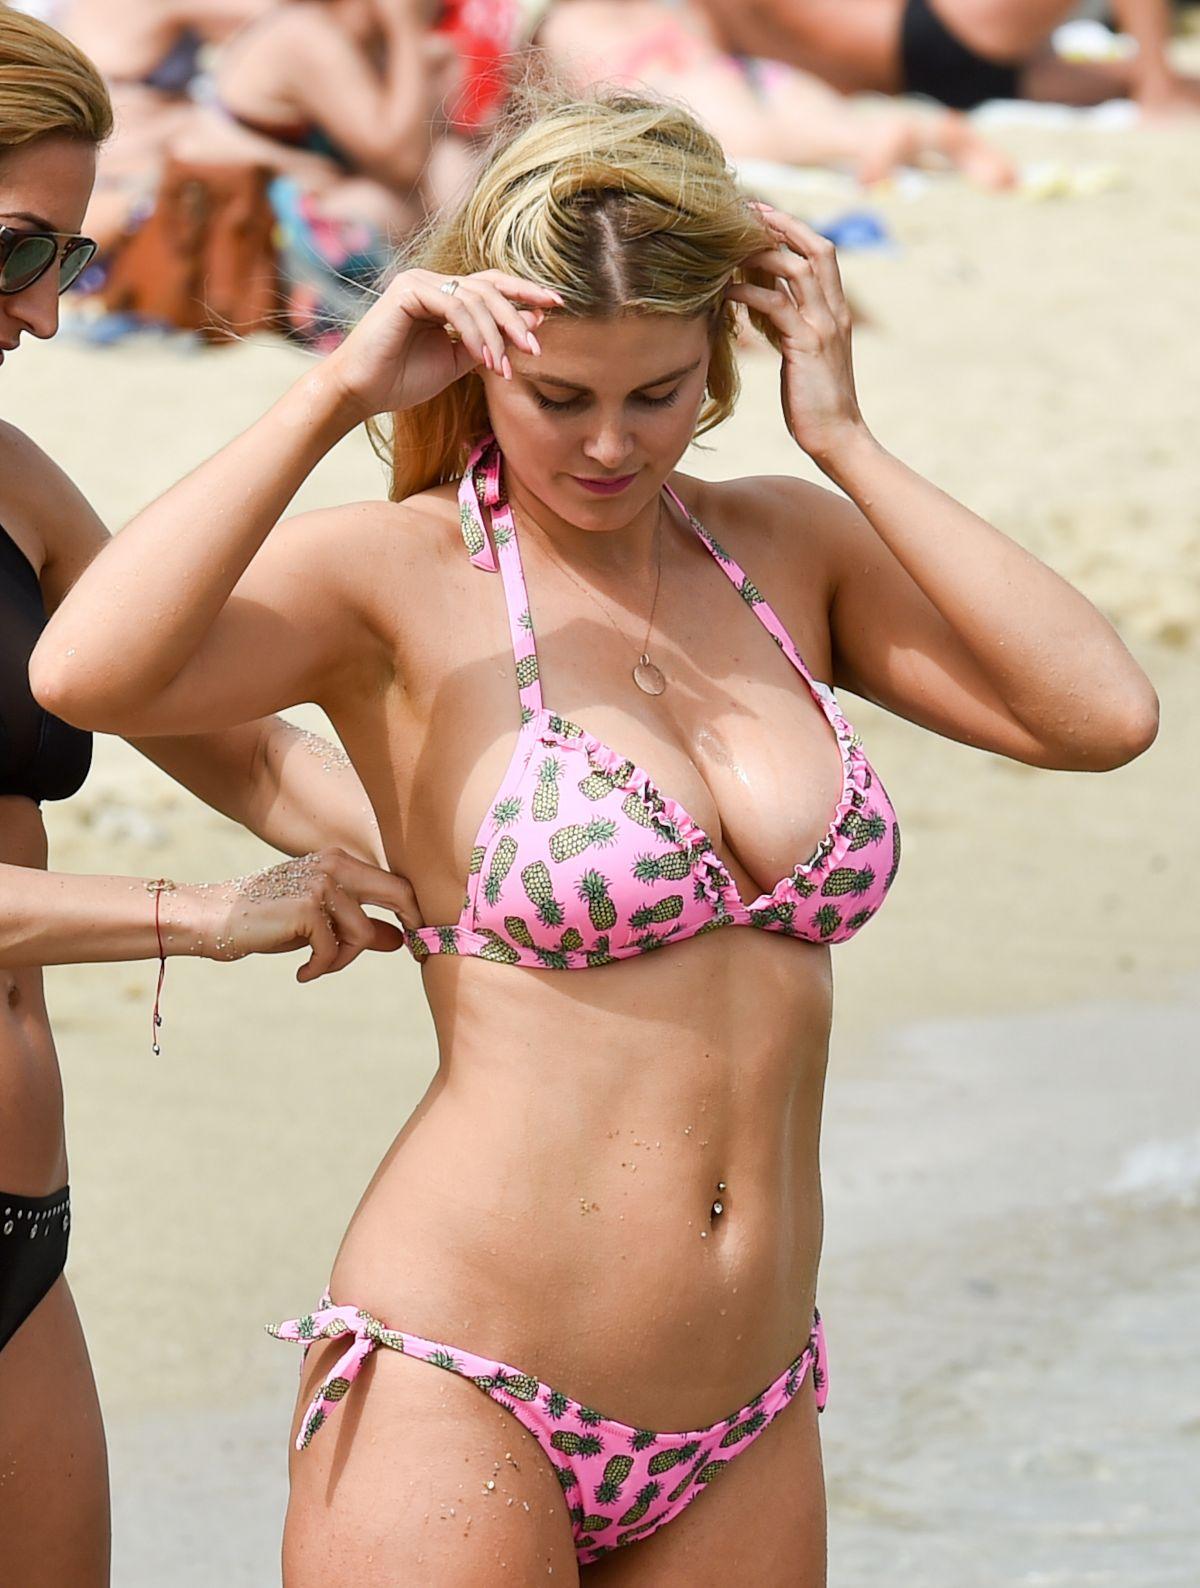 real-beach-bikini-pictures-loud-orgasm-videos